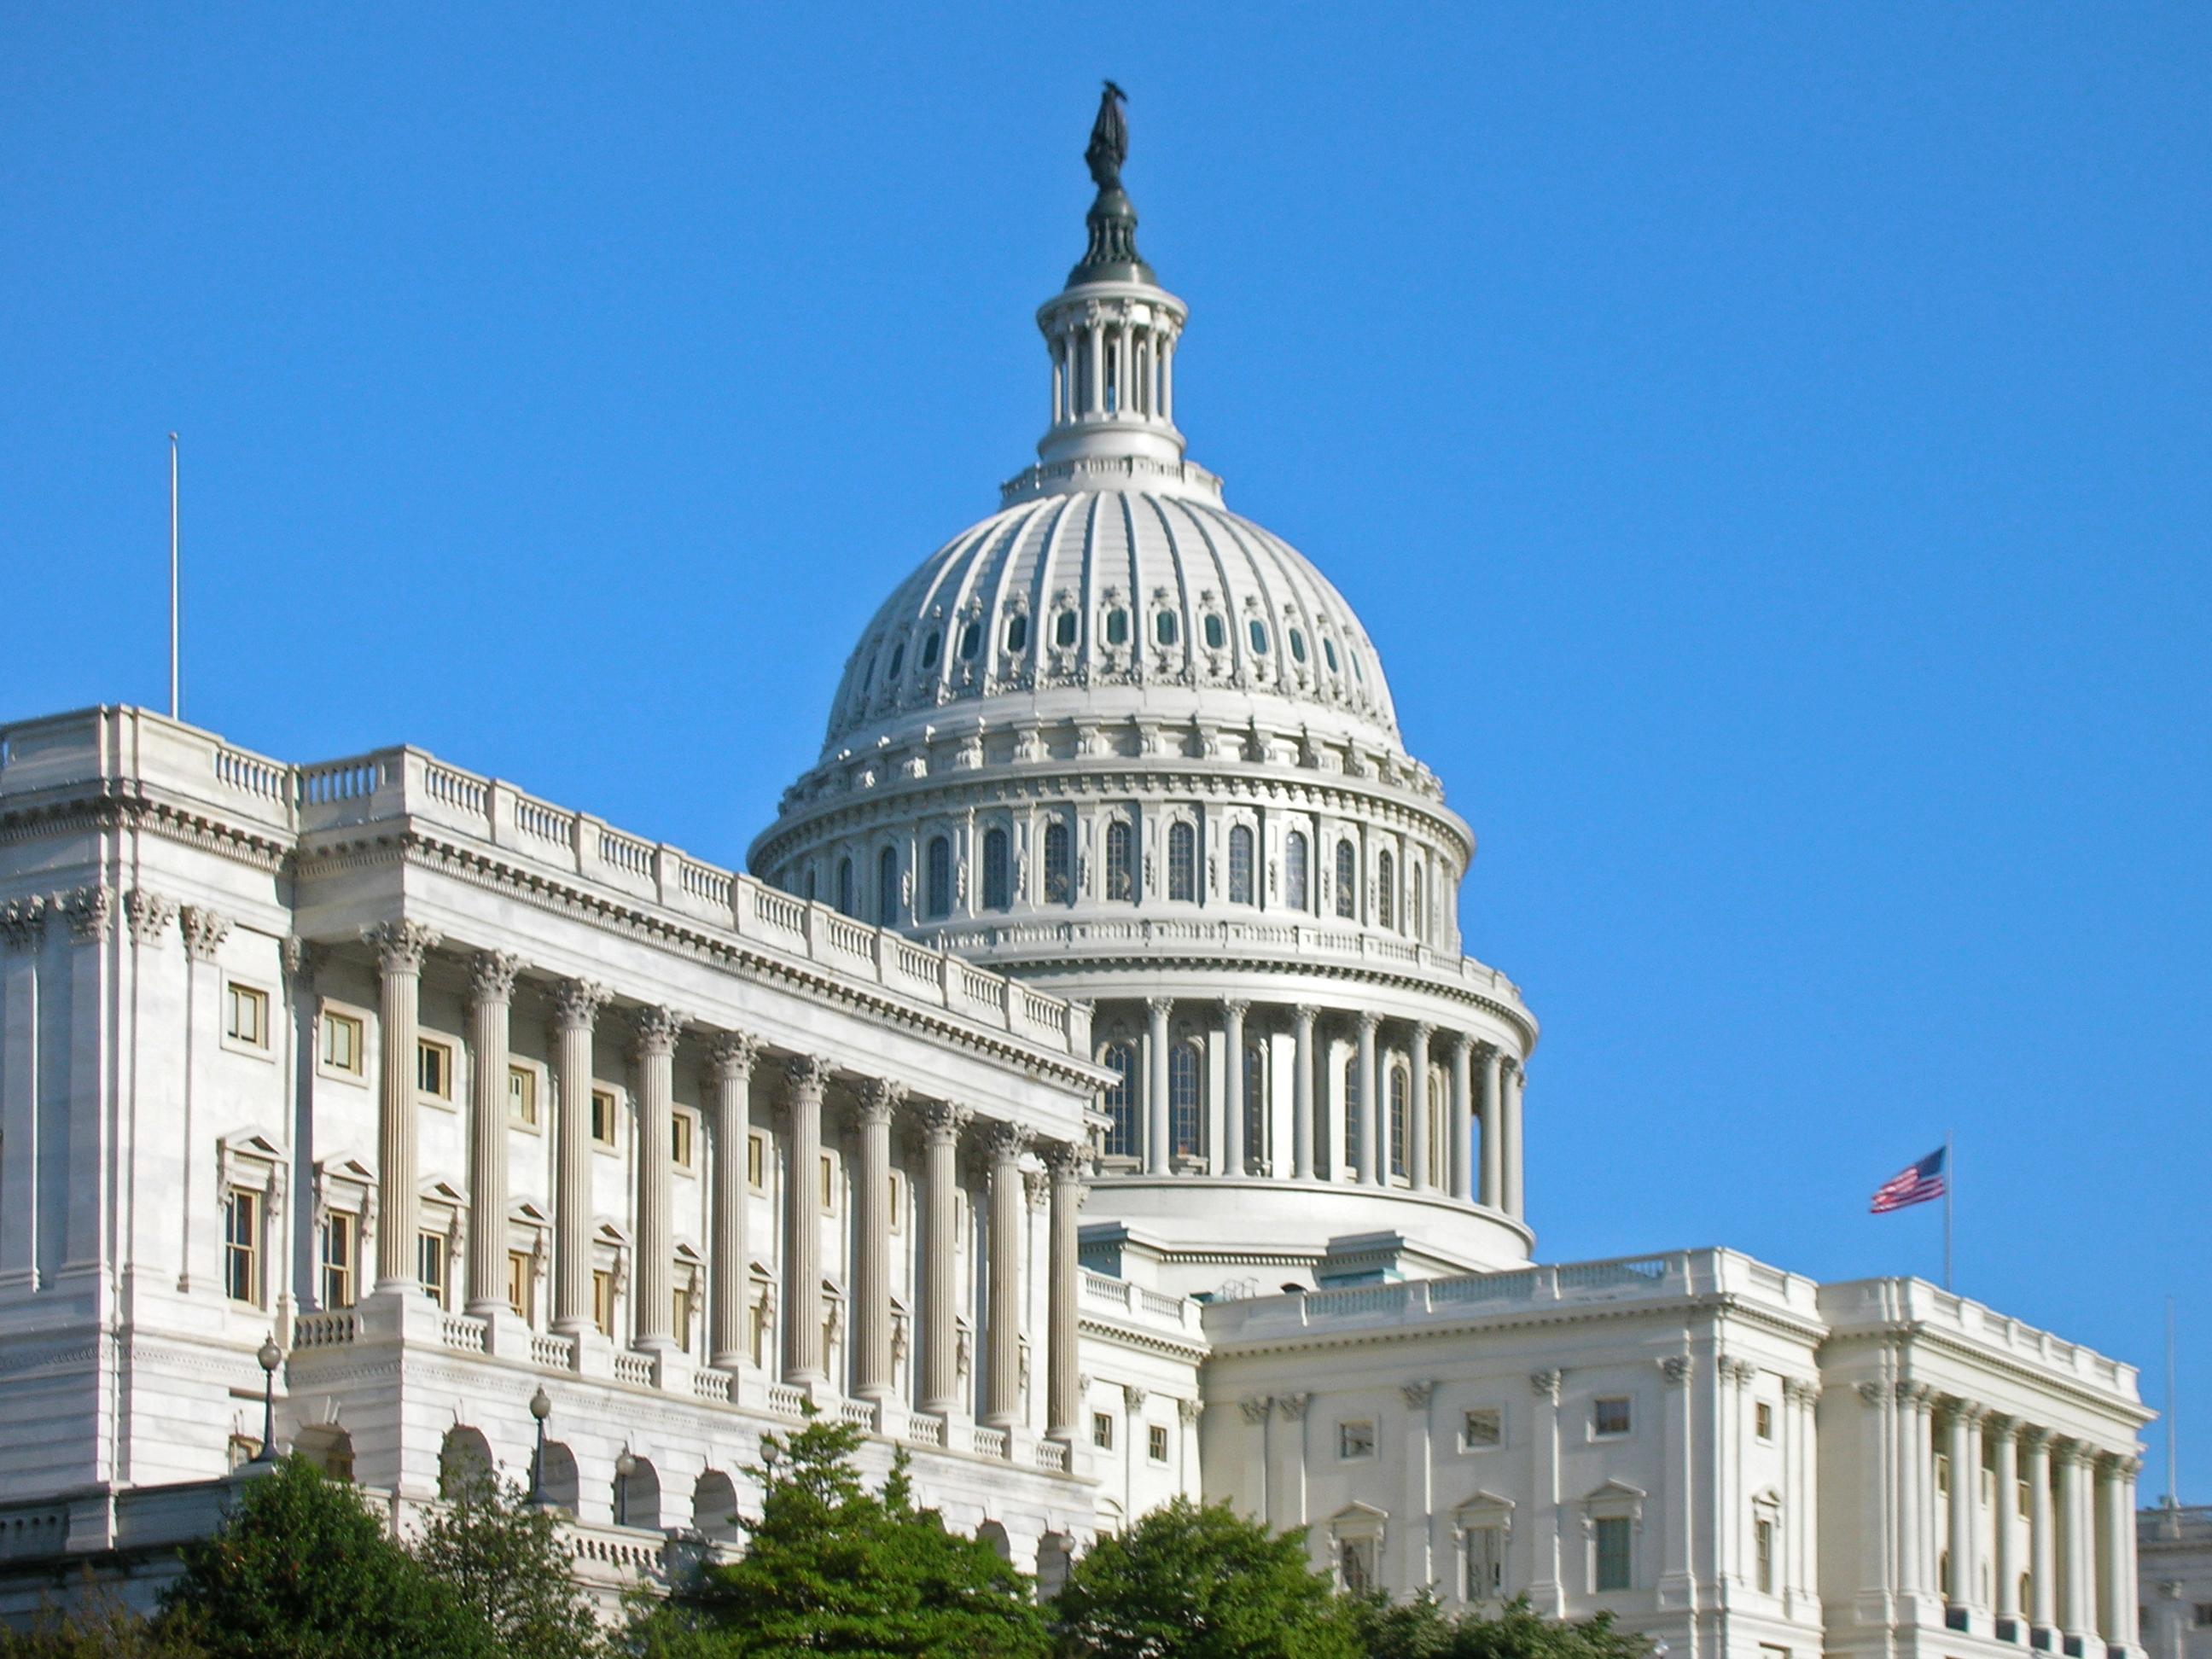 Fuel Tax Hike Proposal Draws Broad Support